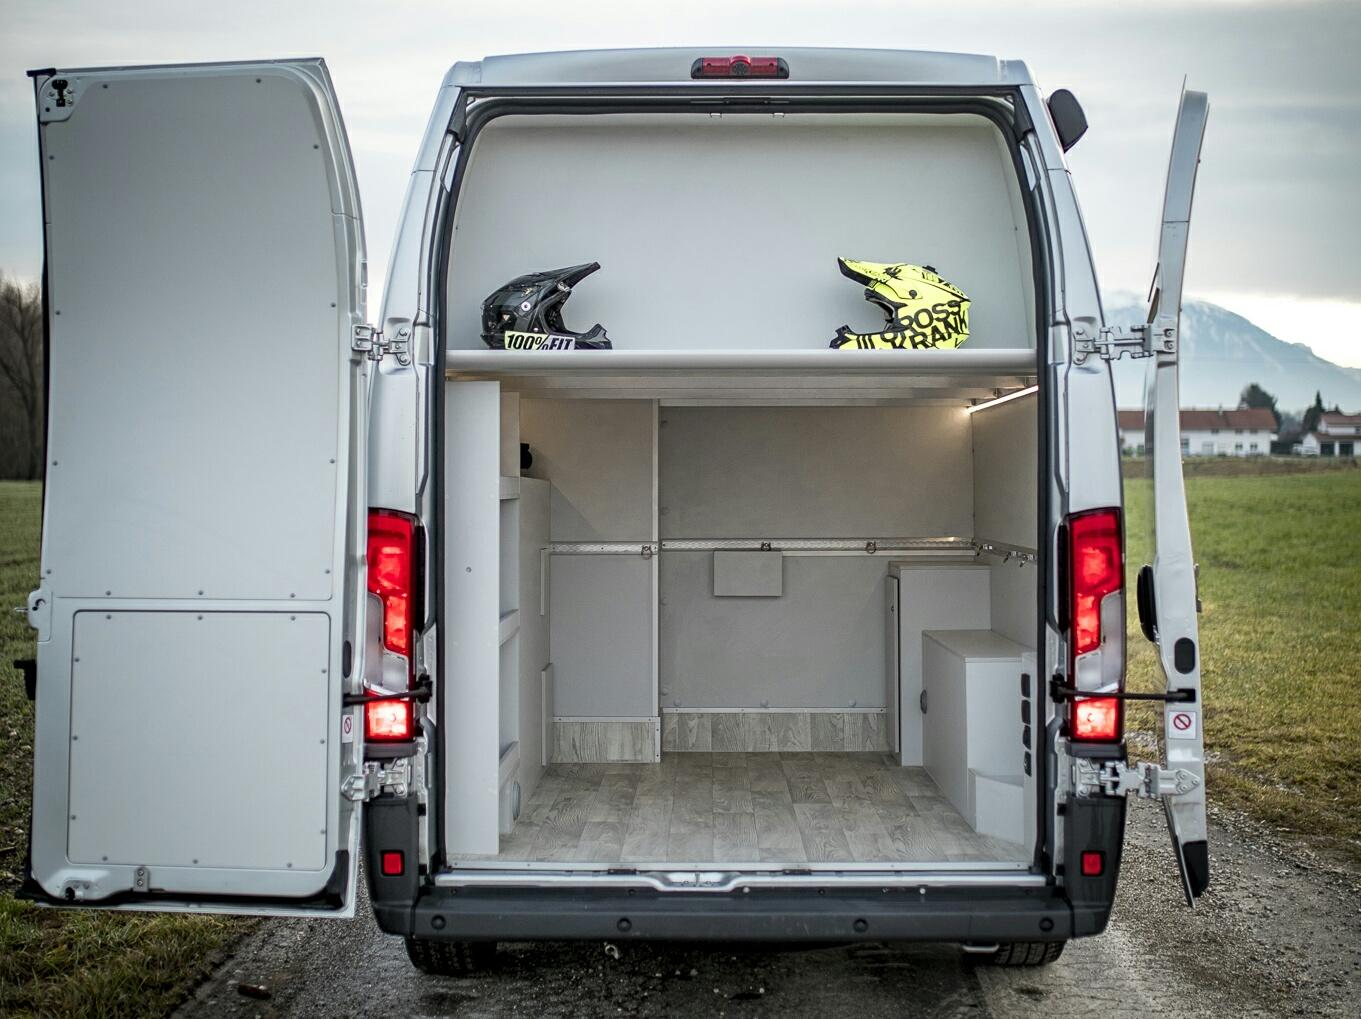 vrm als b rofahrzeug firmenfahrzeug renntransporter vr. Black Bedroom Furniture Sets. Home Design Ideas